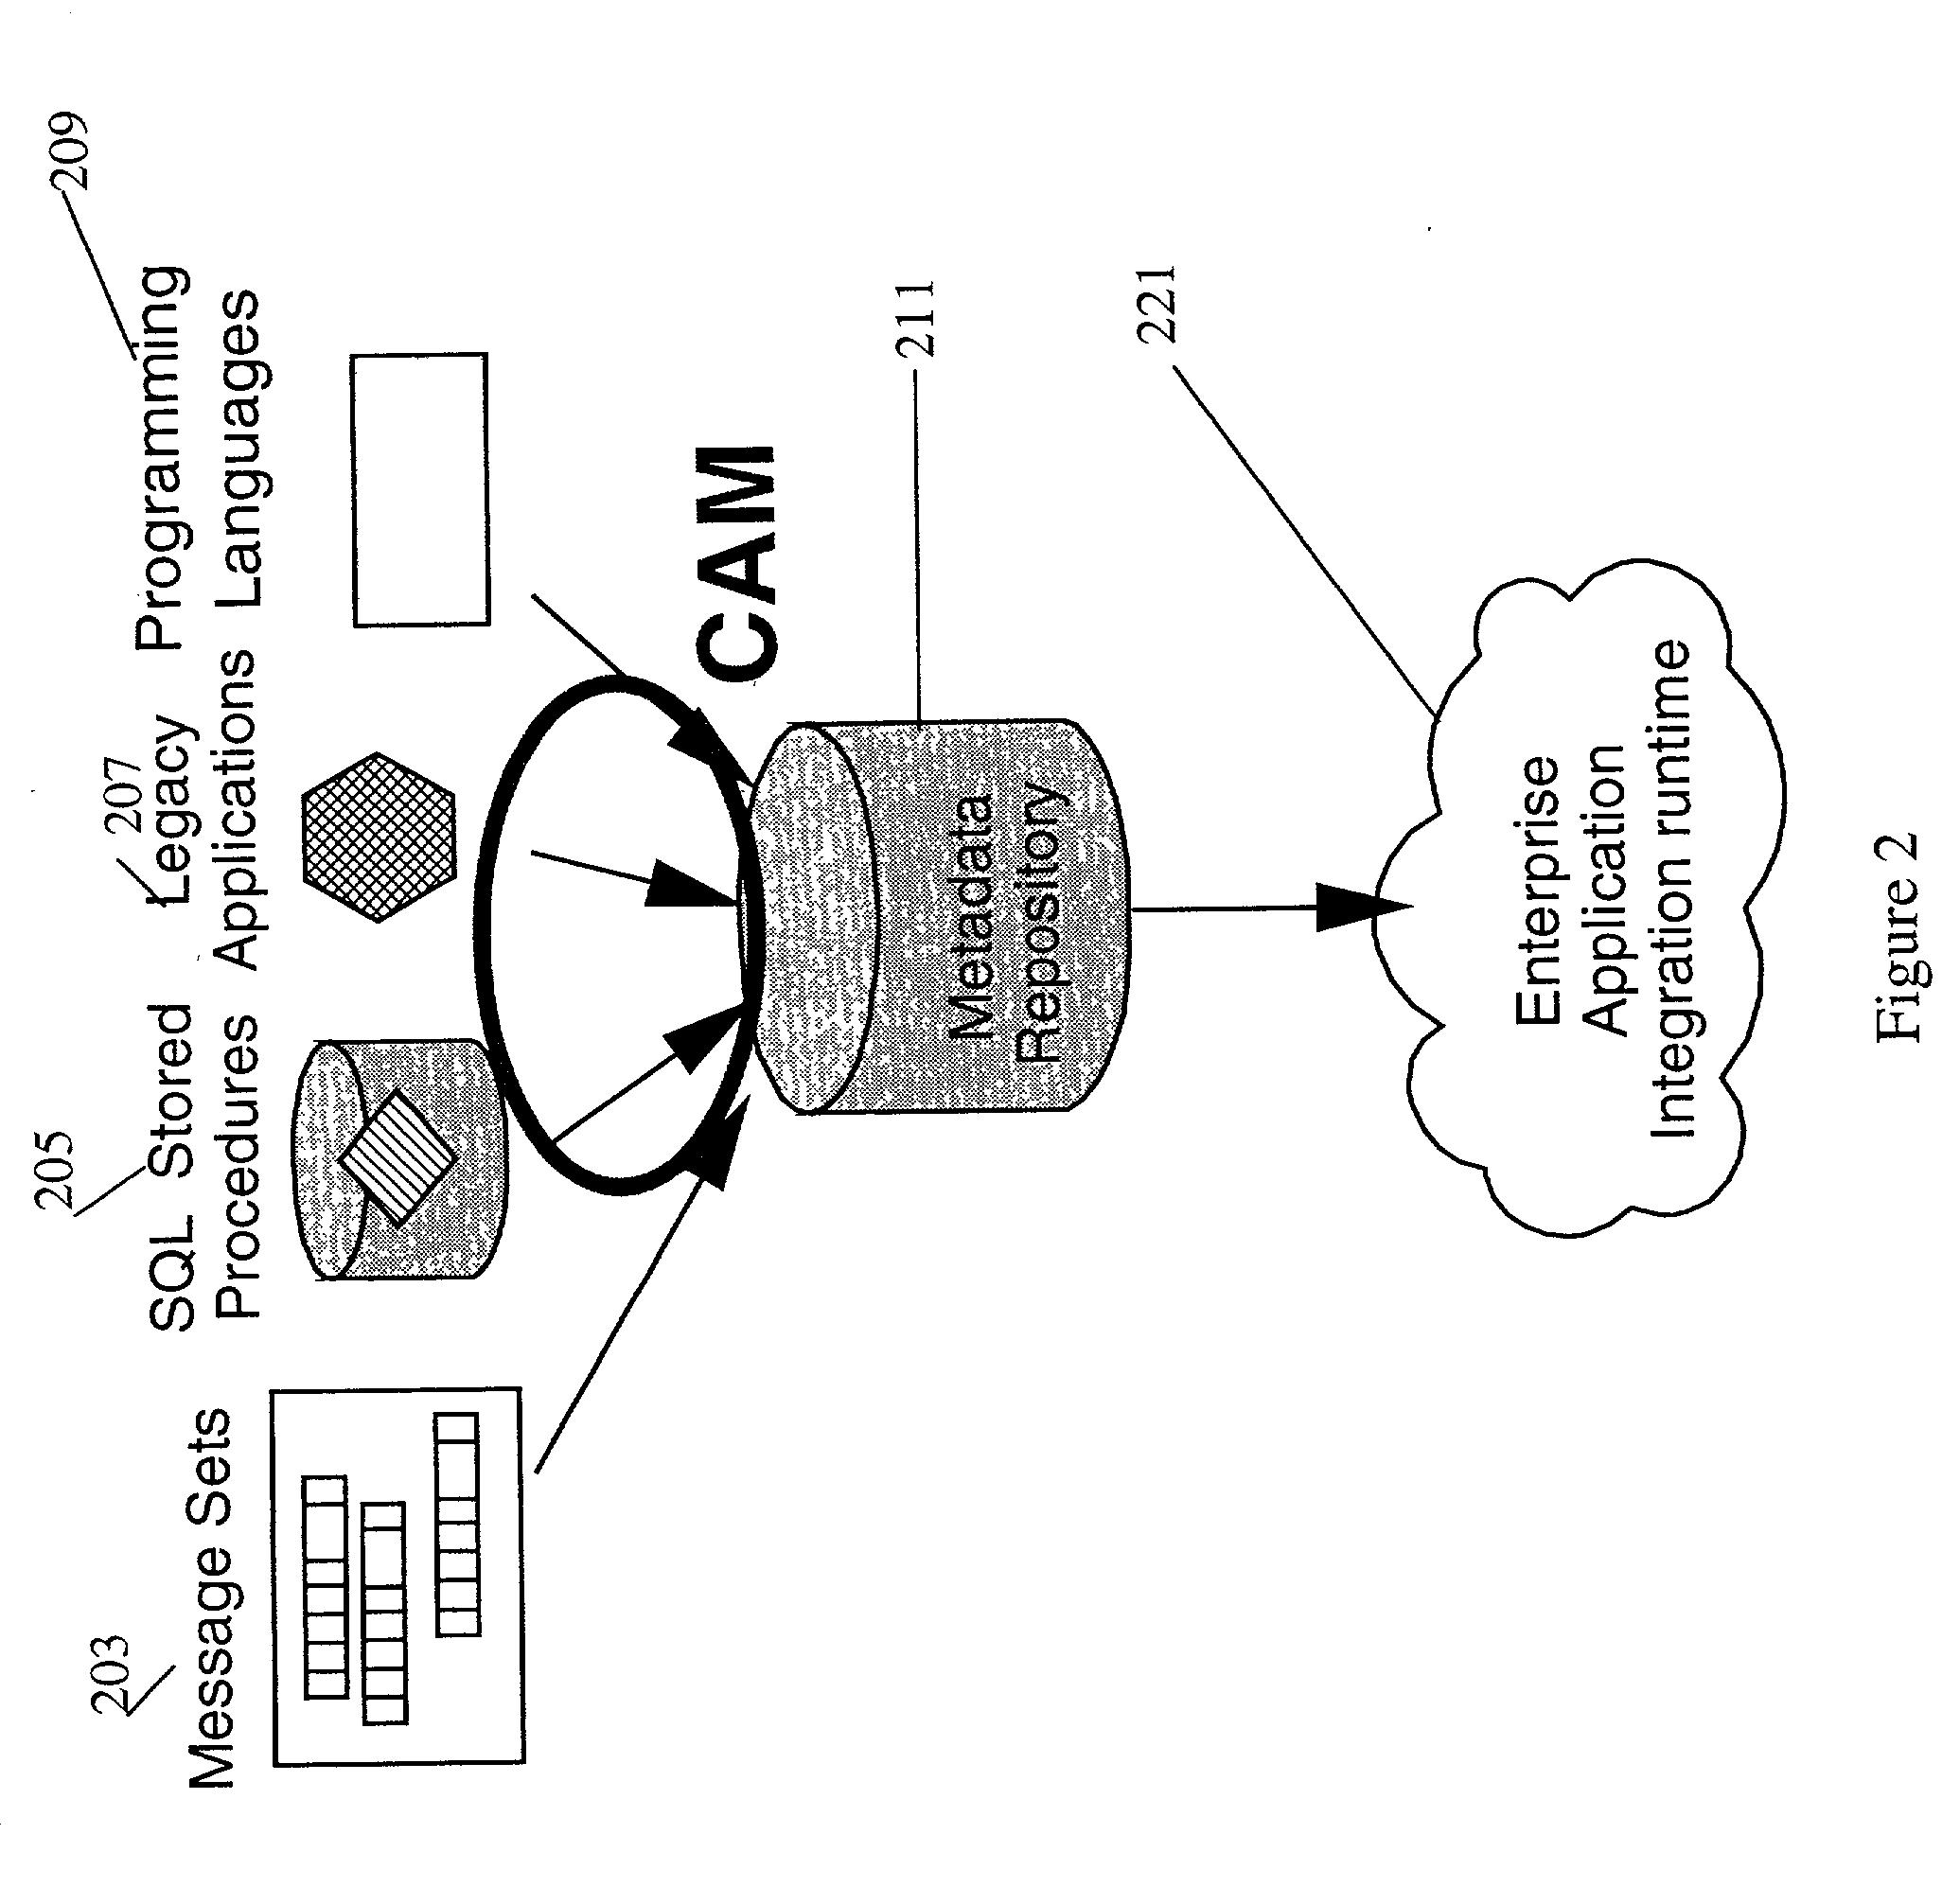 Patent US20020042849 - CICS BMS (Basic Message Service) meta model ...